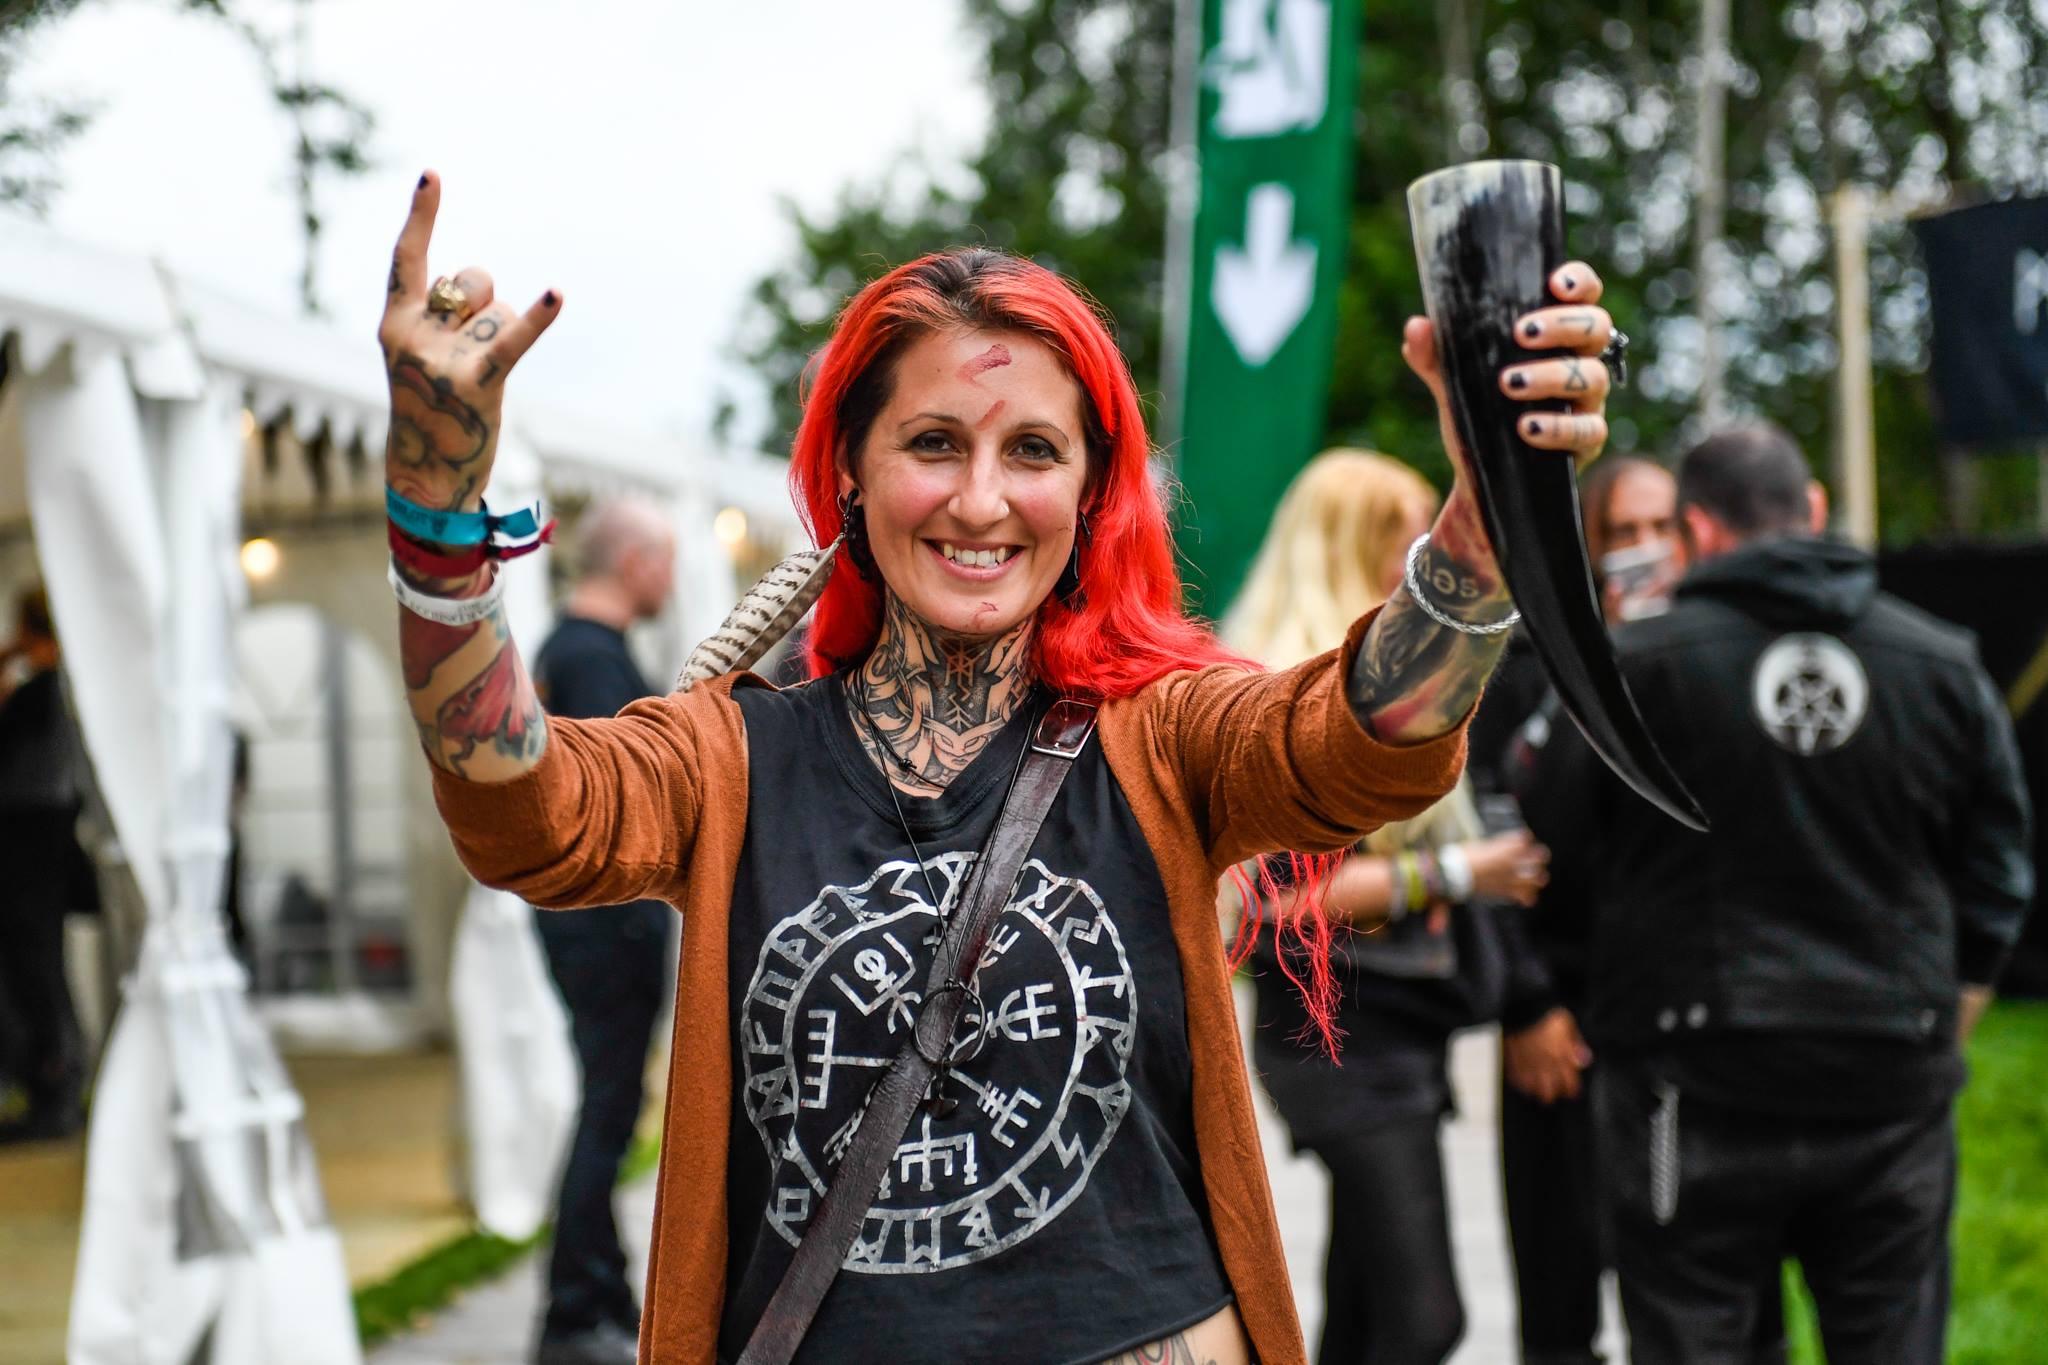 Midgardsblot music festival in Oslo